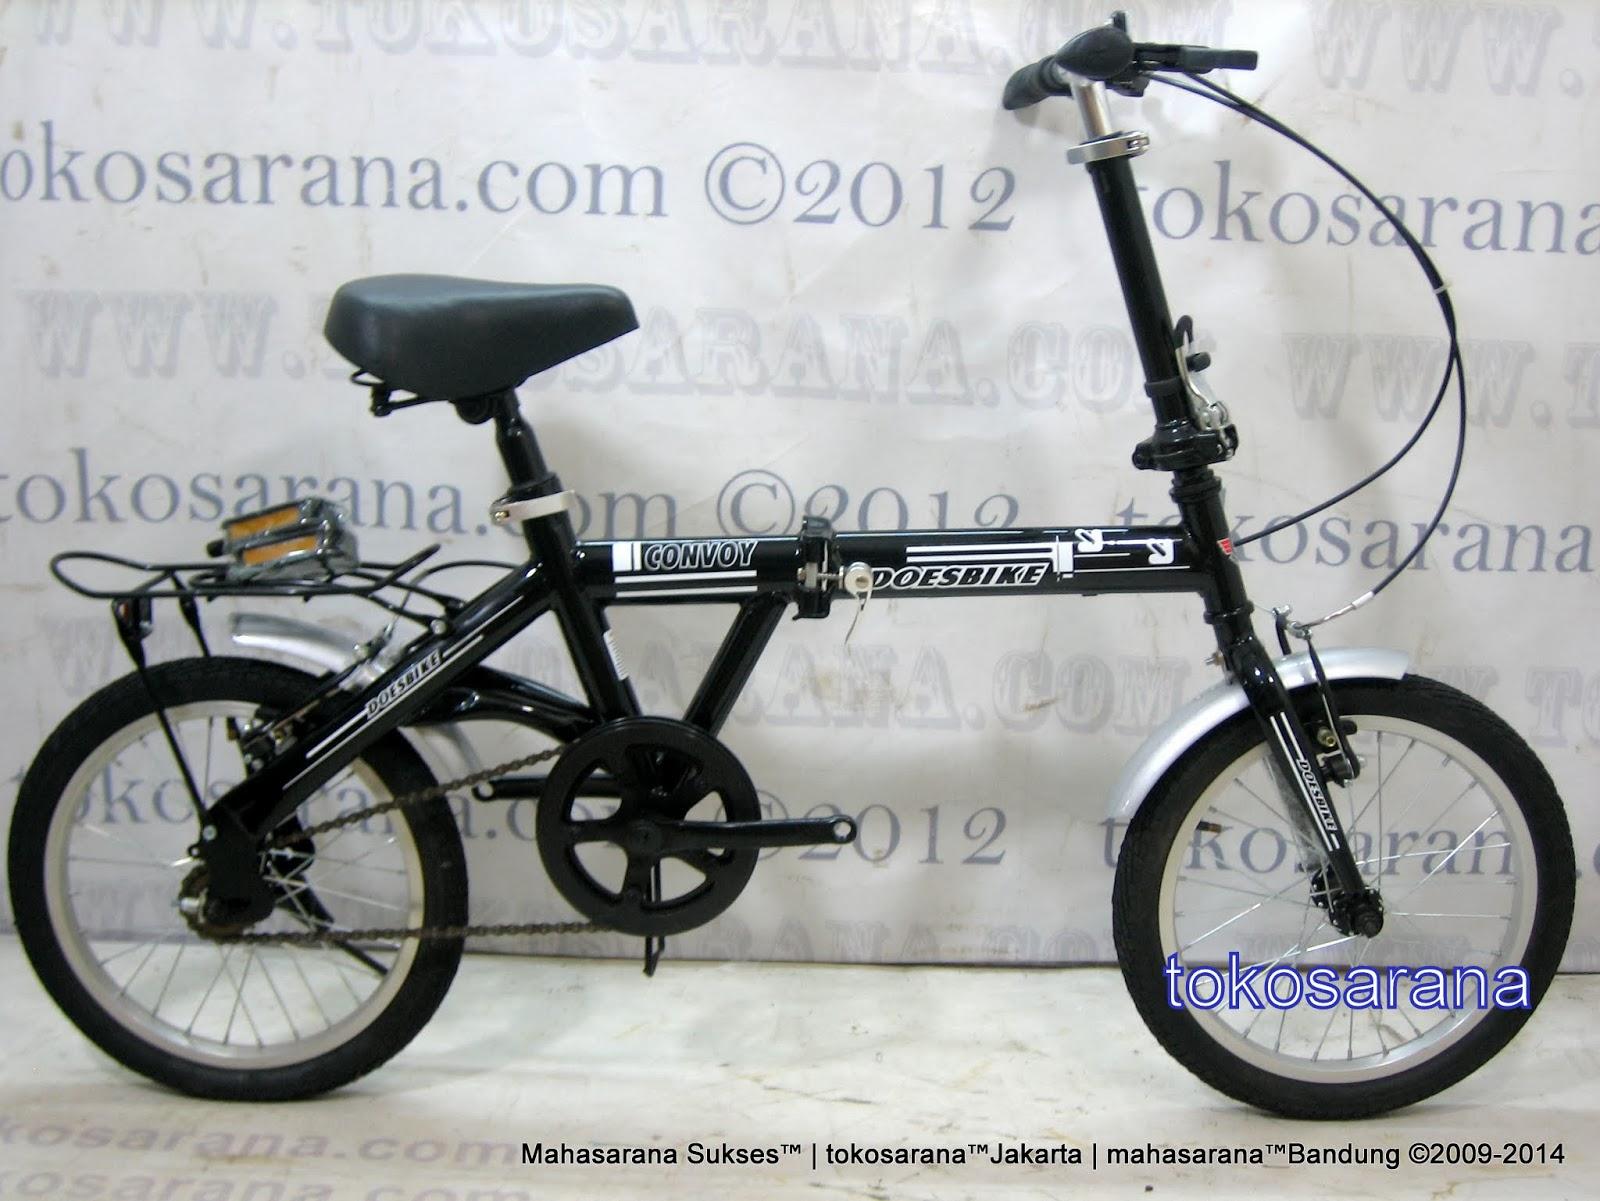 16 Inch DoesBike 1601 Convoy Folding Bike with Carrier